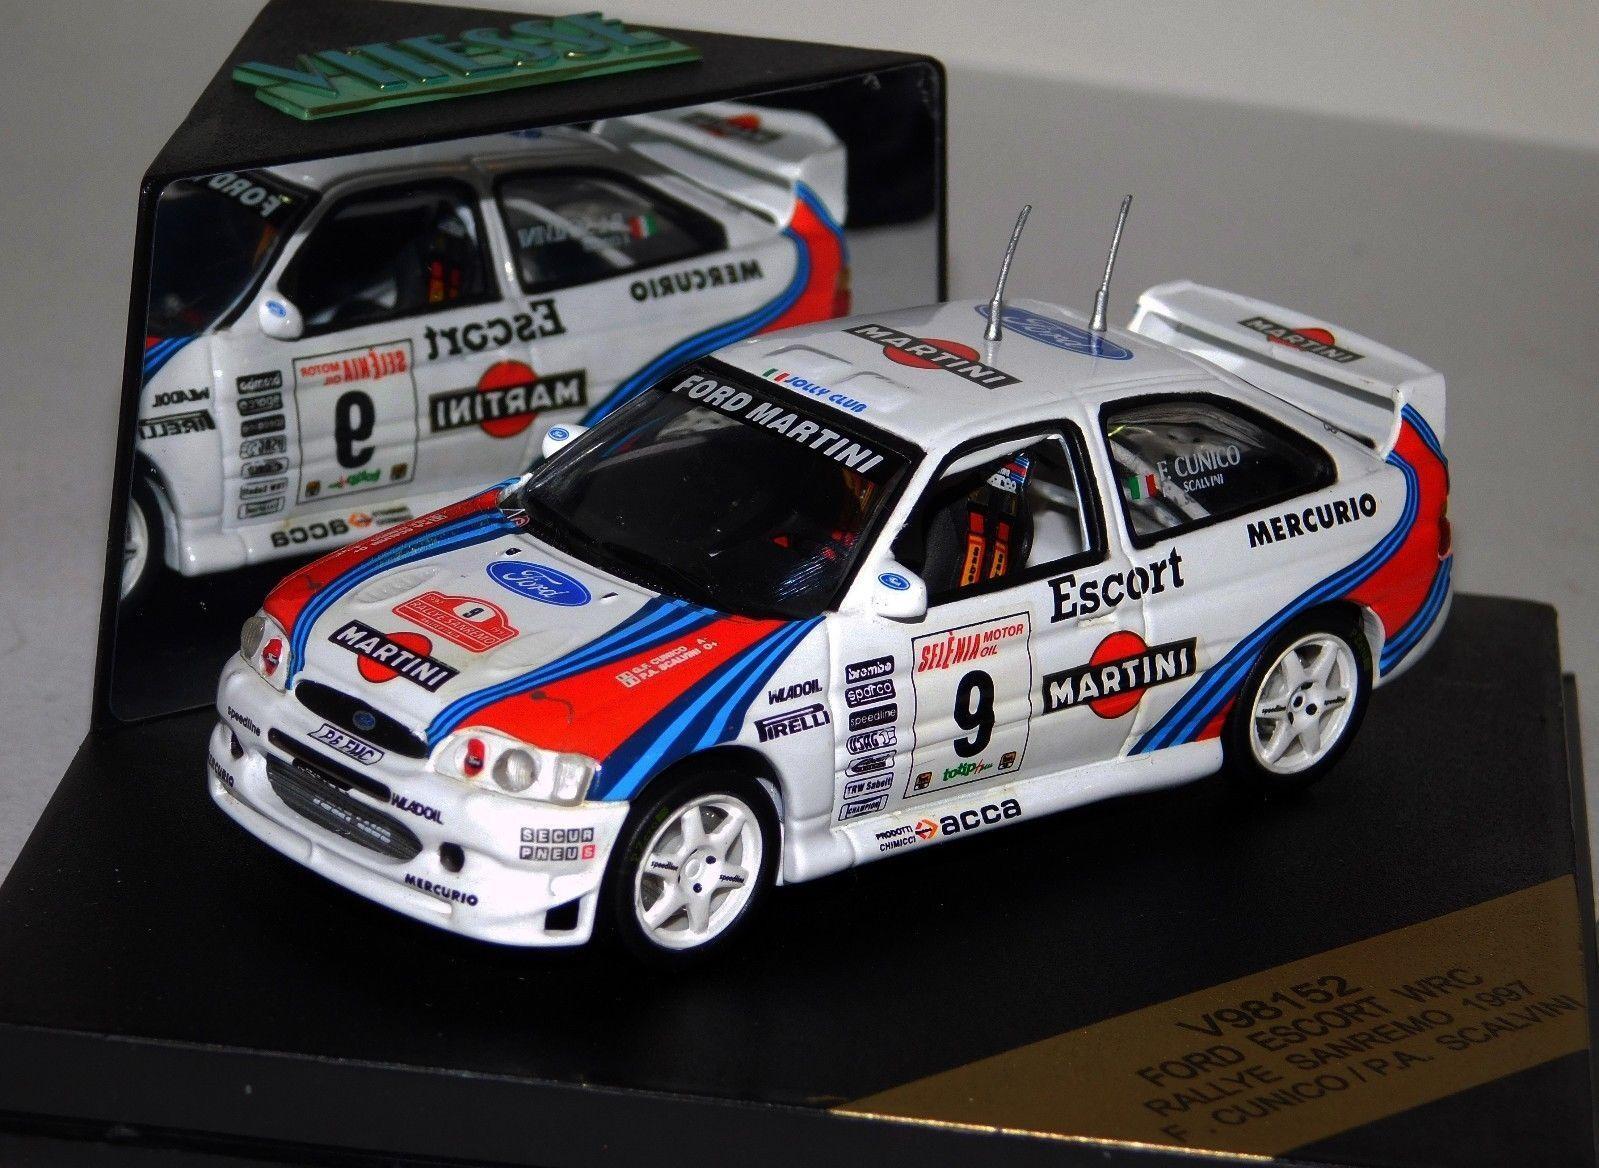 Ford Escort WRC  9 Martini San Remo 1997 Cunico Vitesse V98152 1 43